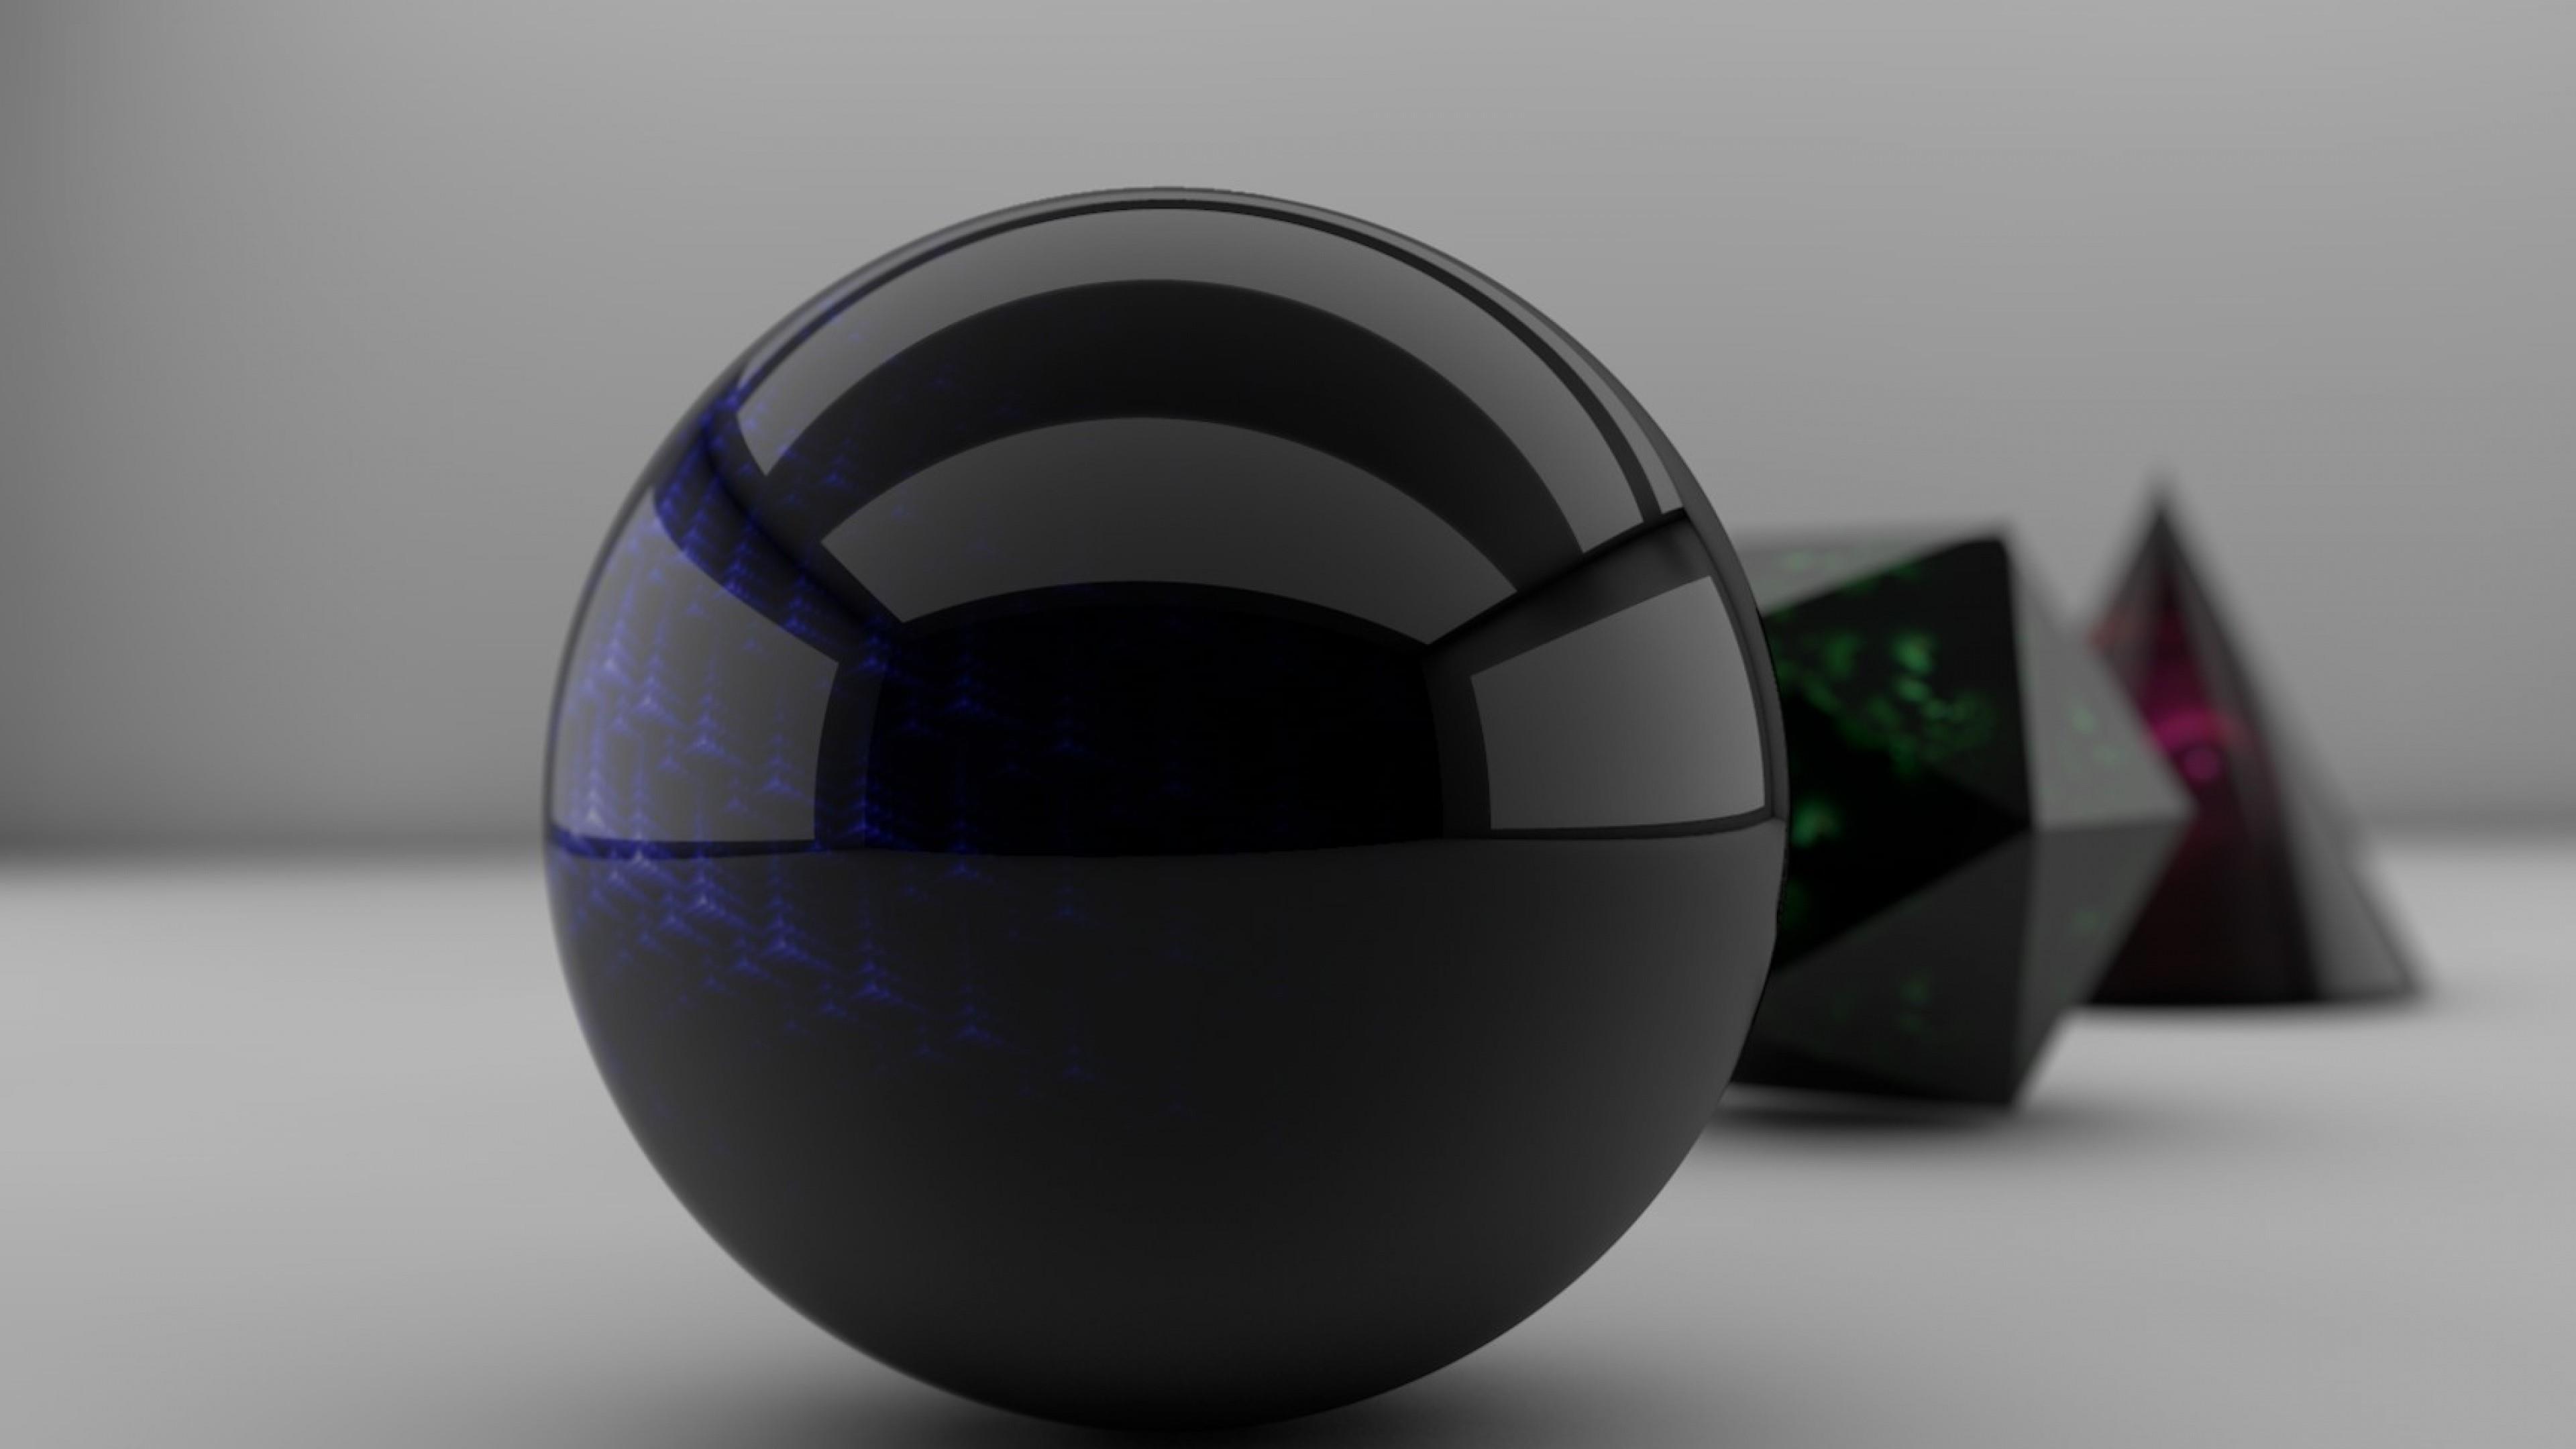 3D sphere wallpaper